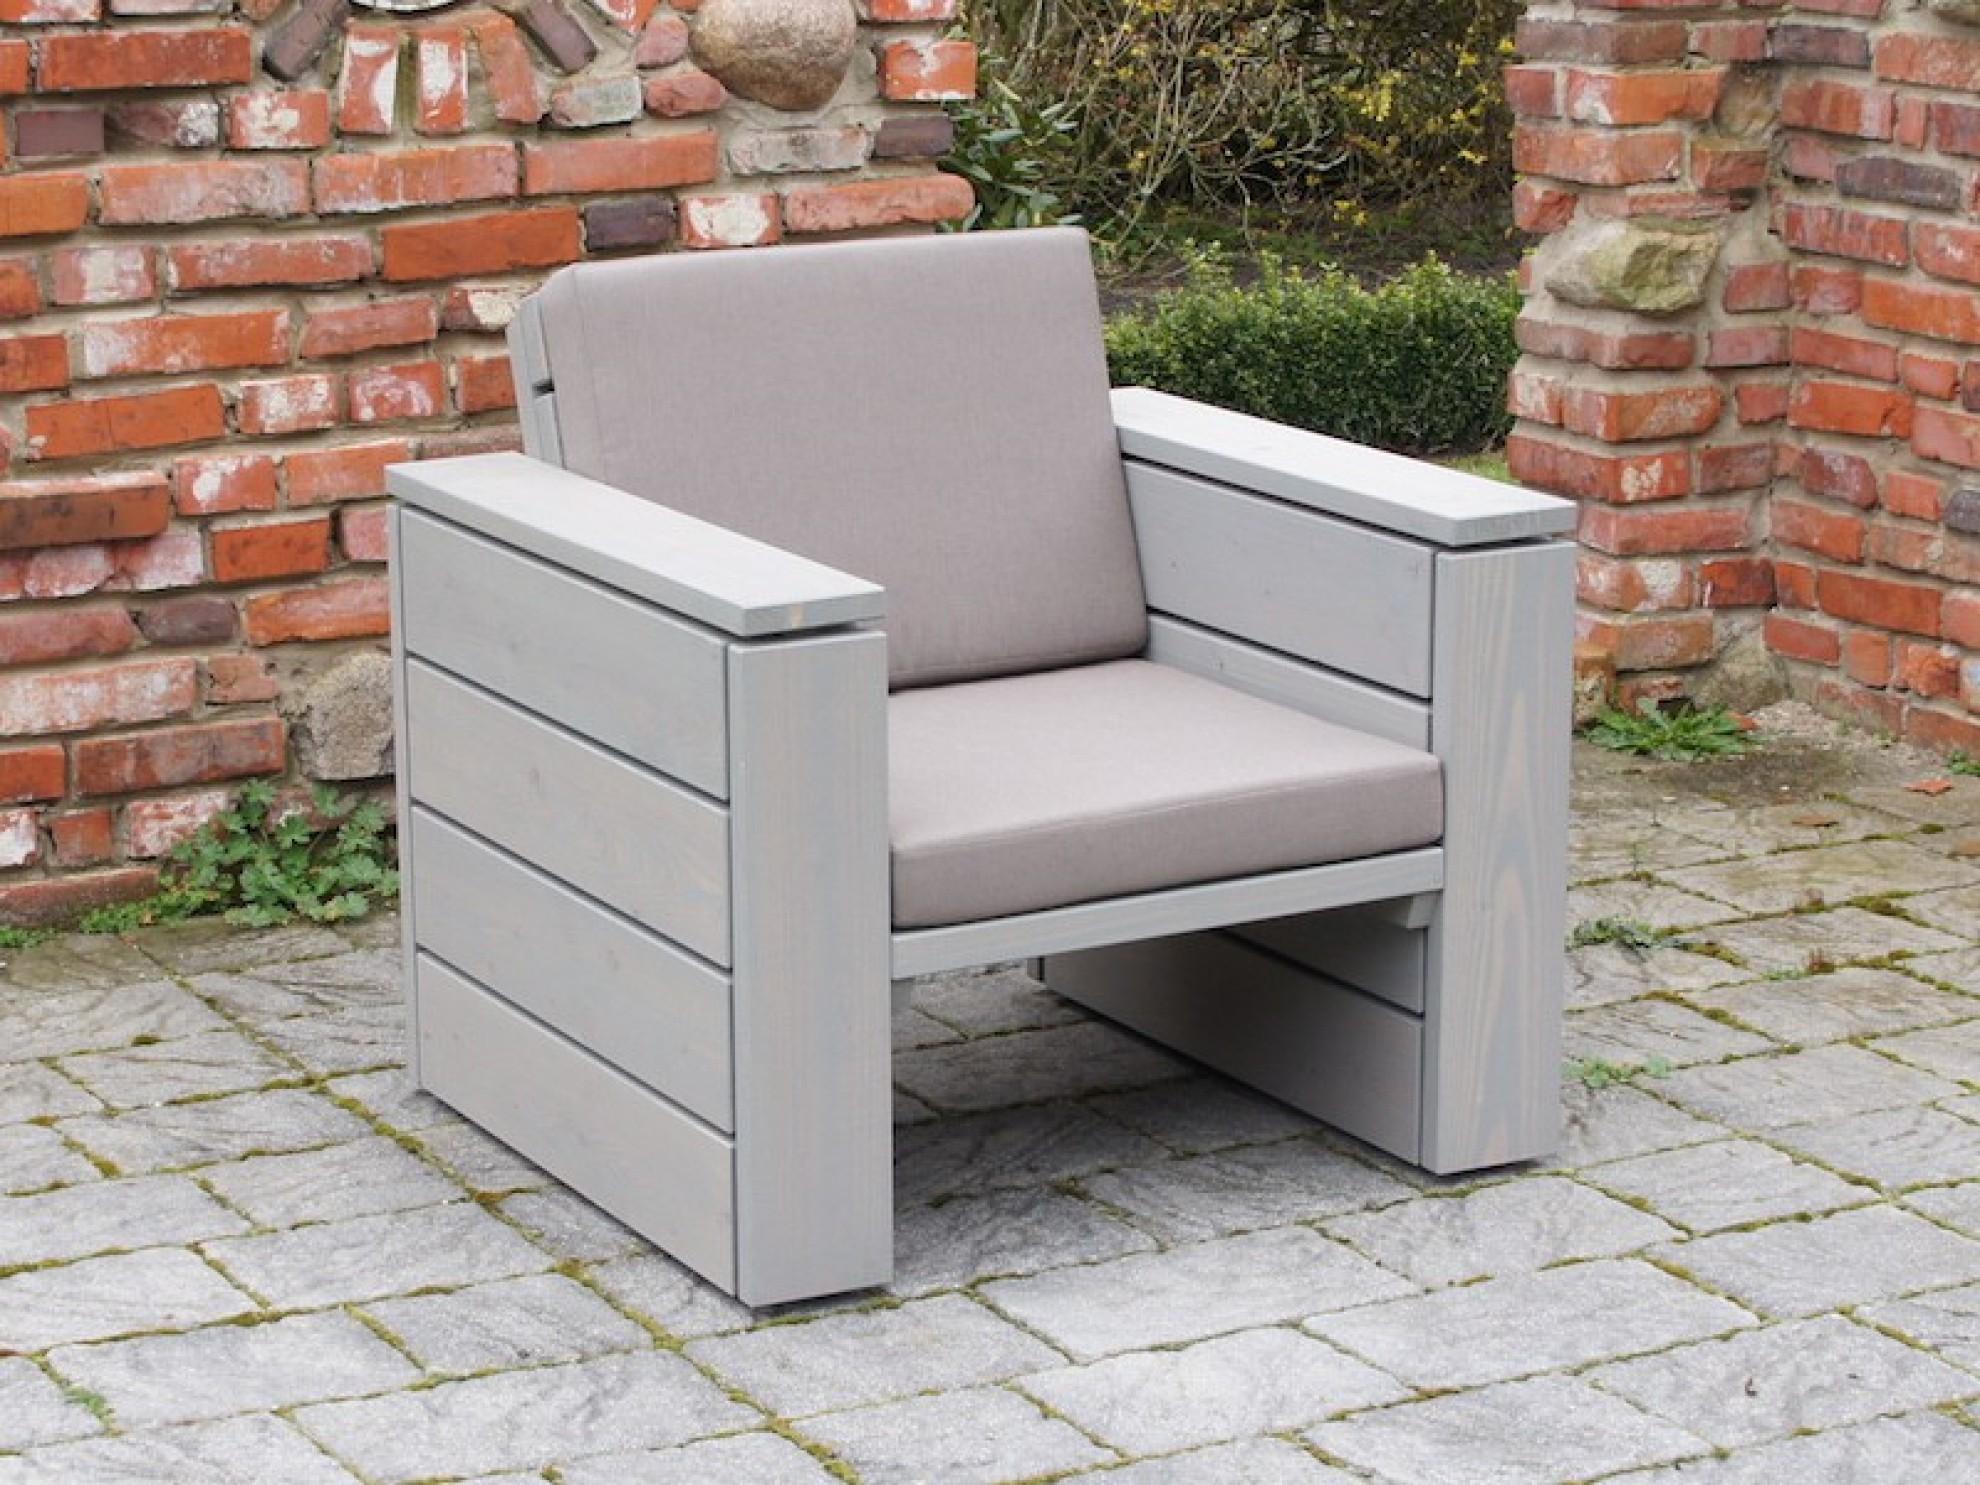 Lounge sessel holz  Lounge Sessel - Zeitlose Loungemöbel aus heimischem Holz